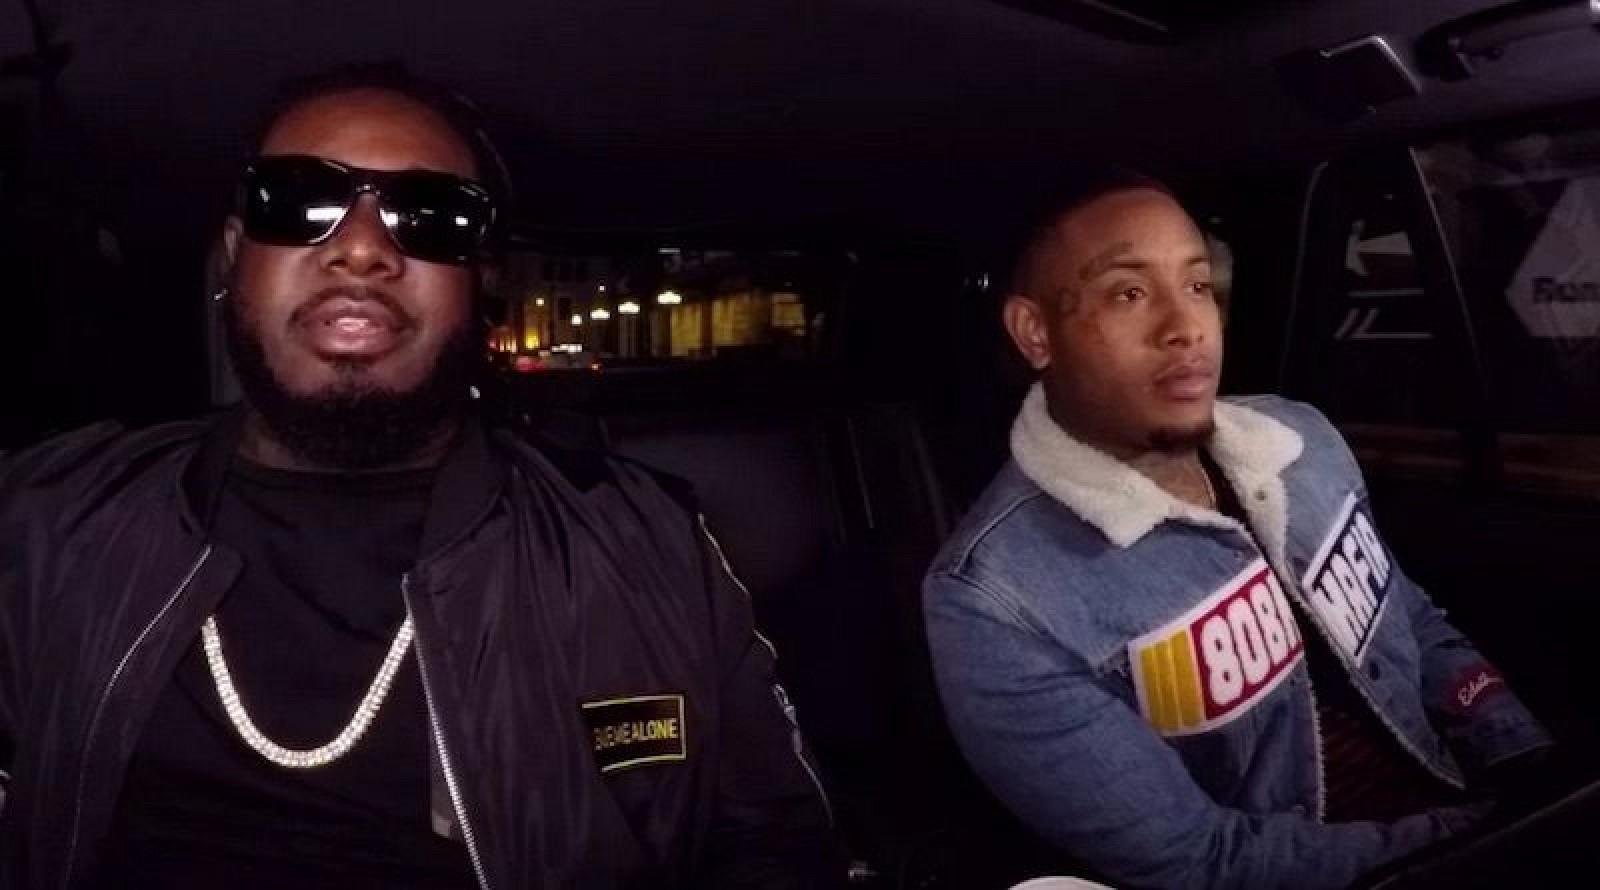 Spotify Launching Carpool Karaoke-Like Series Called 'Traffic Jams', Focusing on Original Music